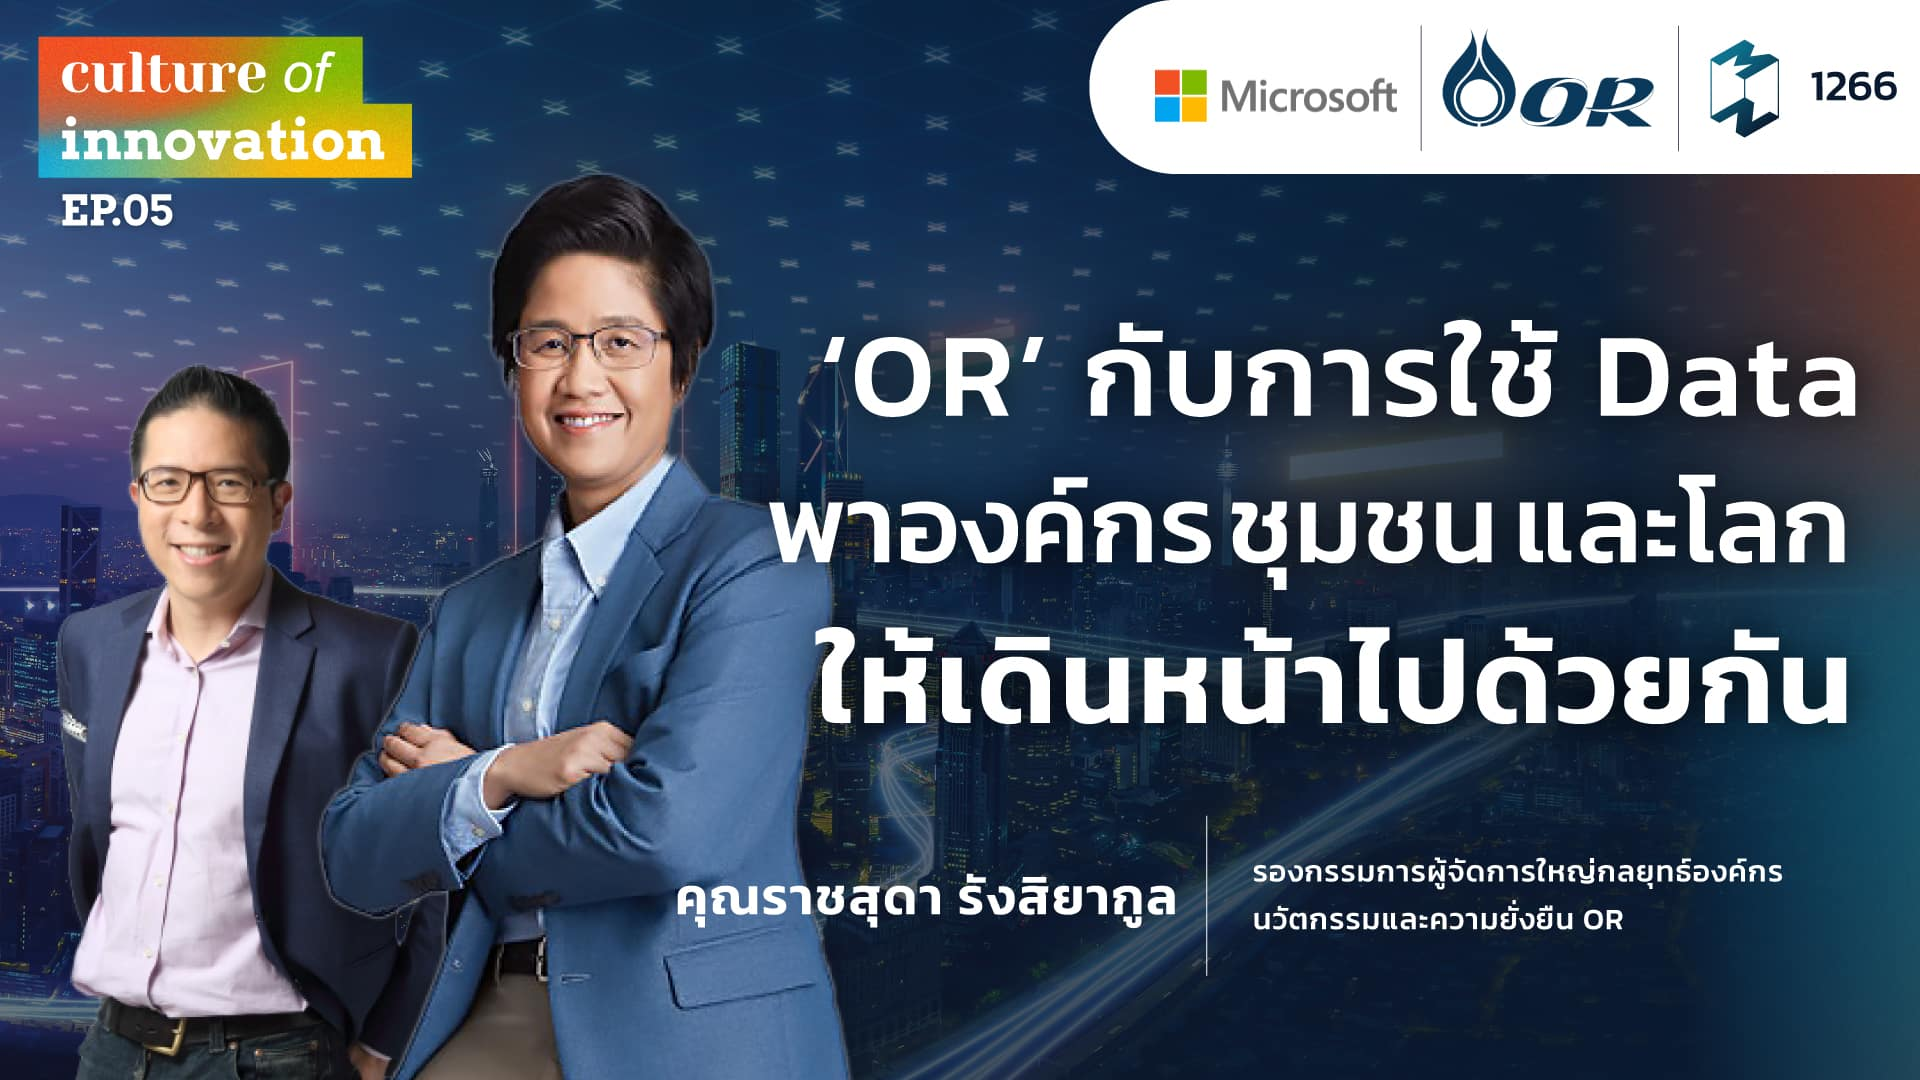 'OR' กับการใช้ Data พาองค์กร ชุมชน และโลกให้เดินหน้าไปด้วยกัน | MM Culture of Innovation EP.1266